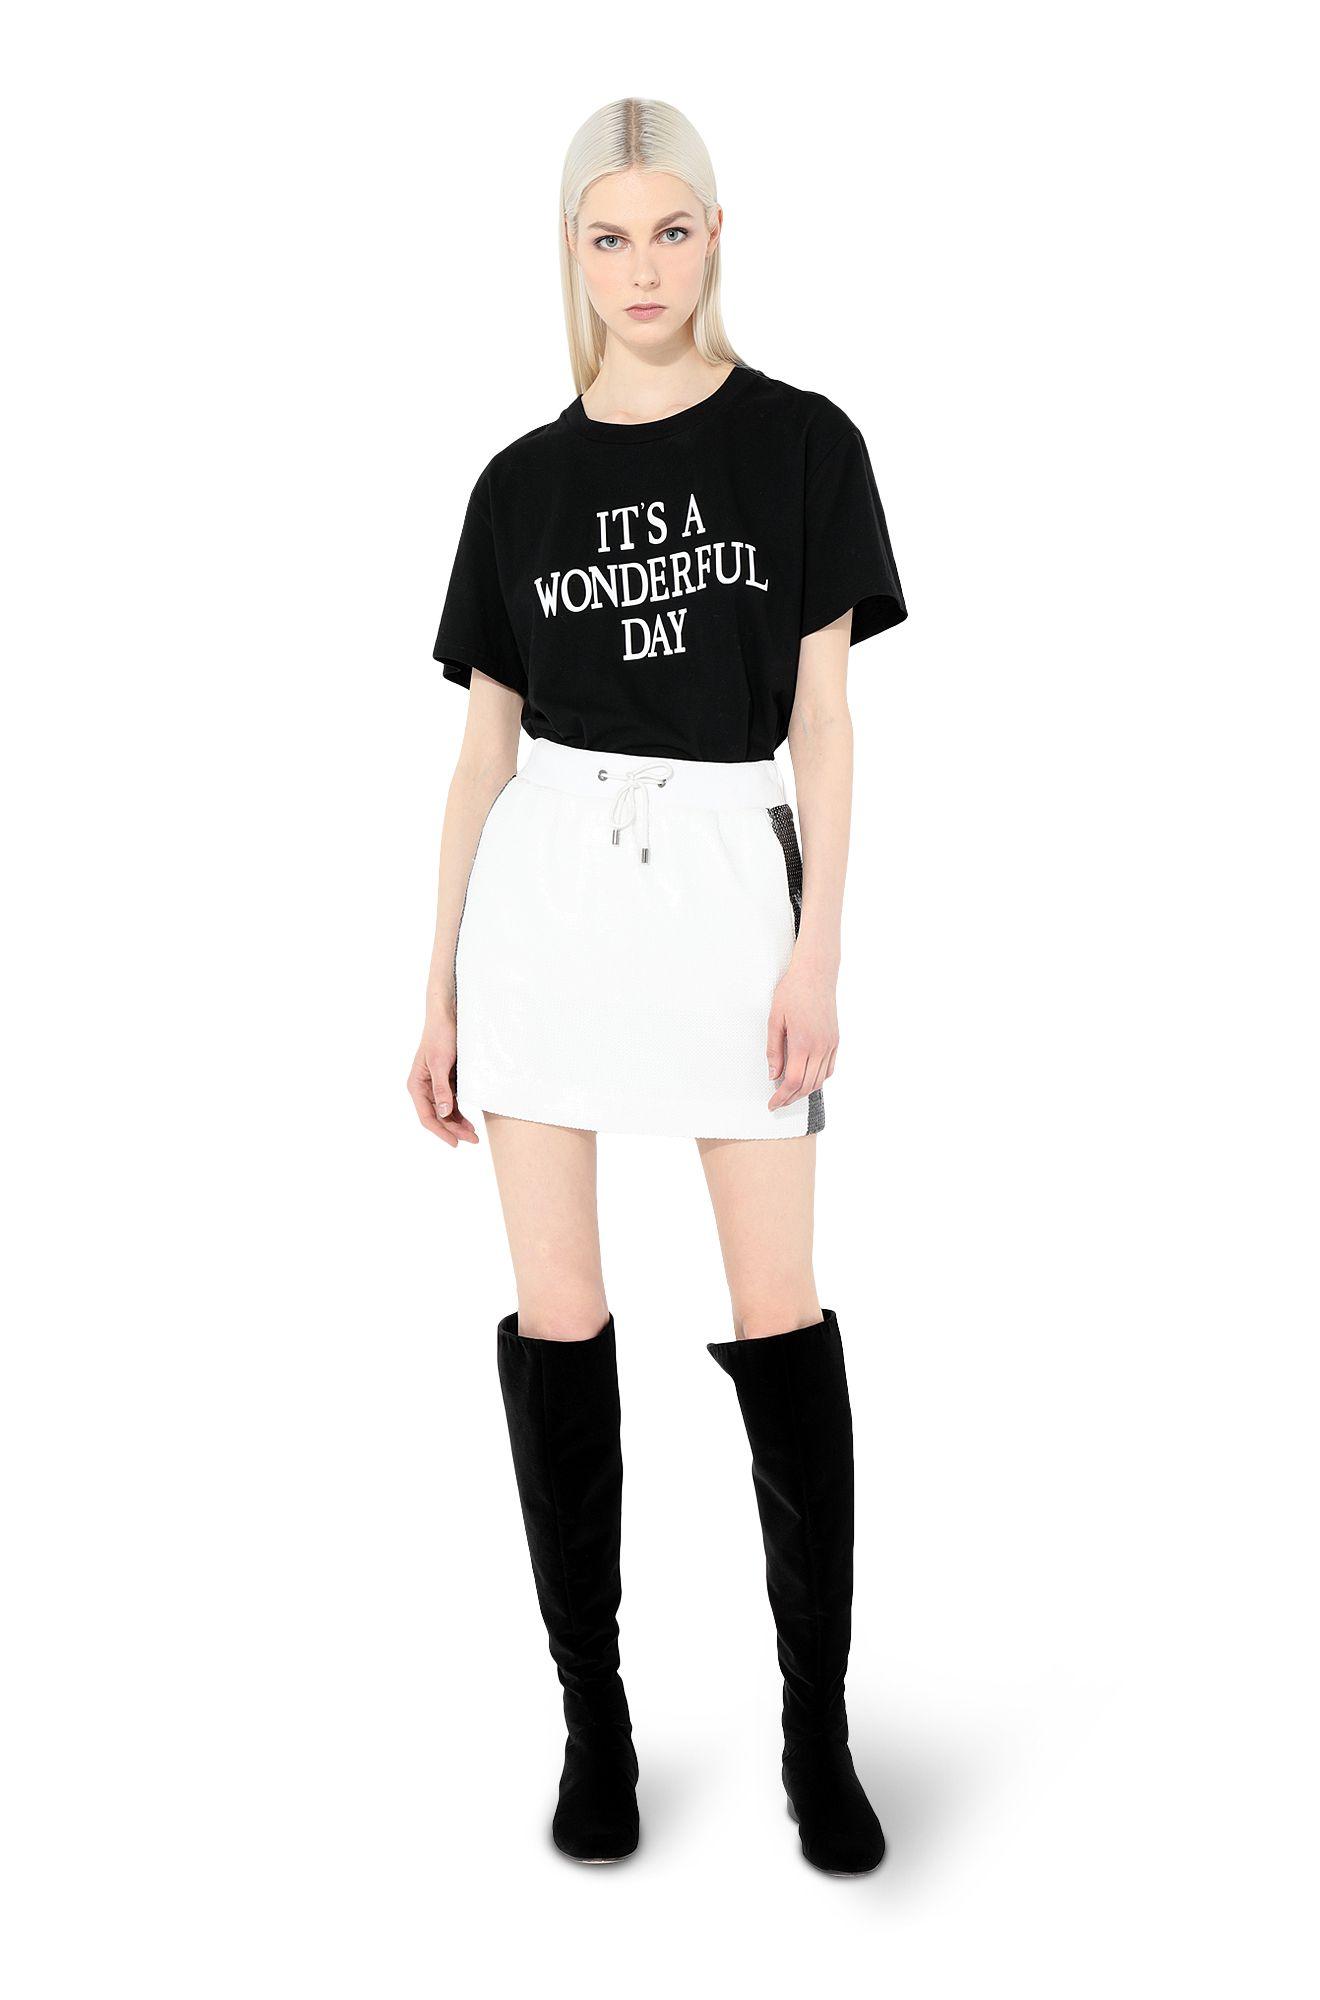 IT'S A WANDERFUL DAYプリントTシャツ